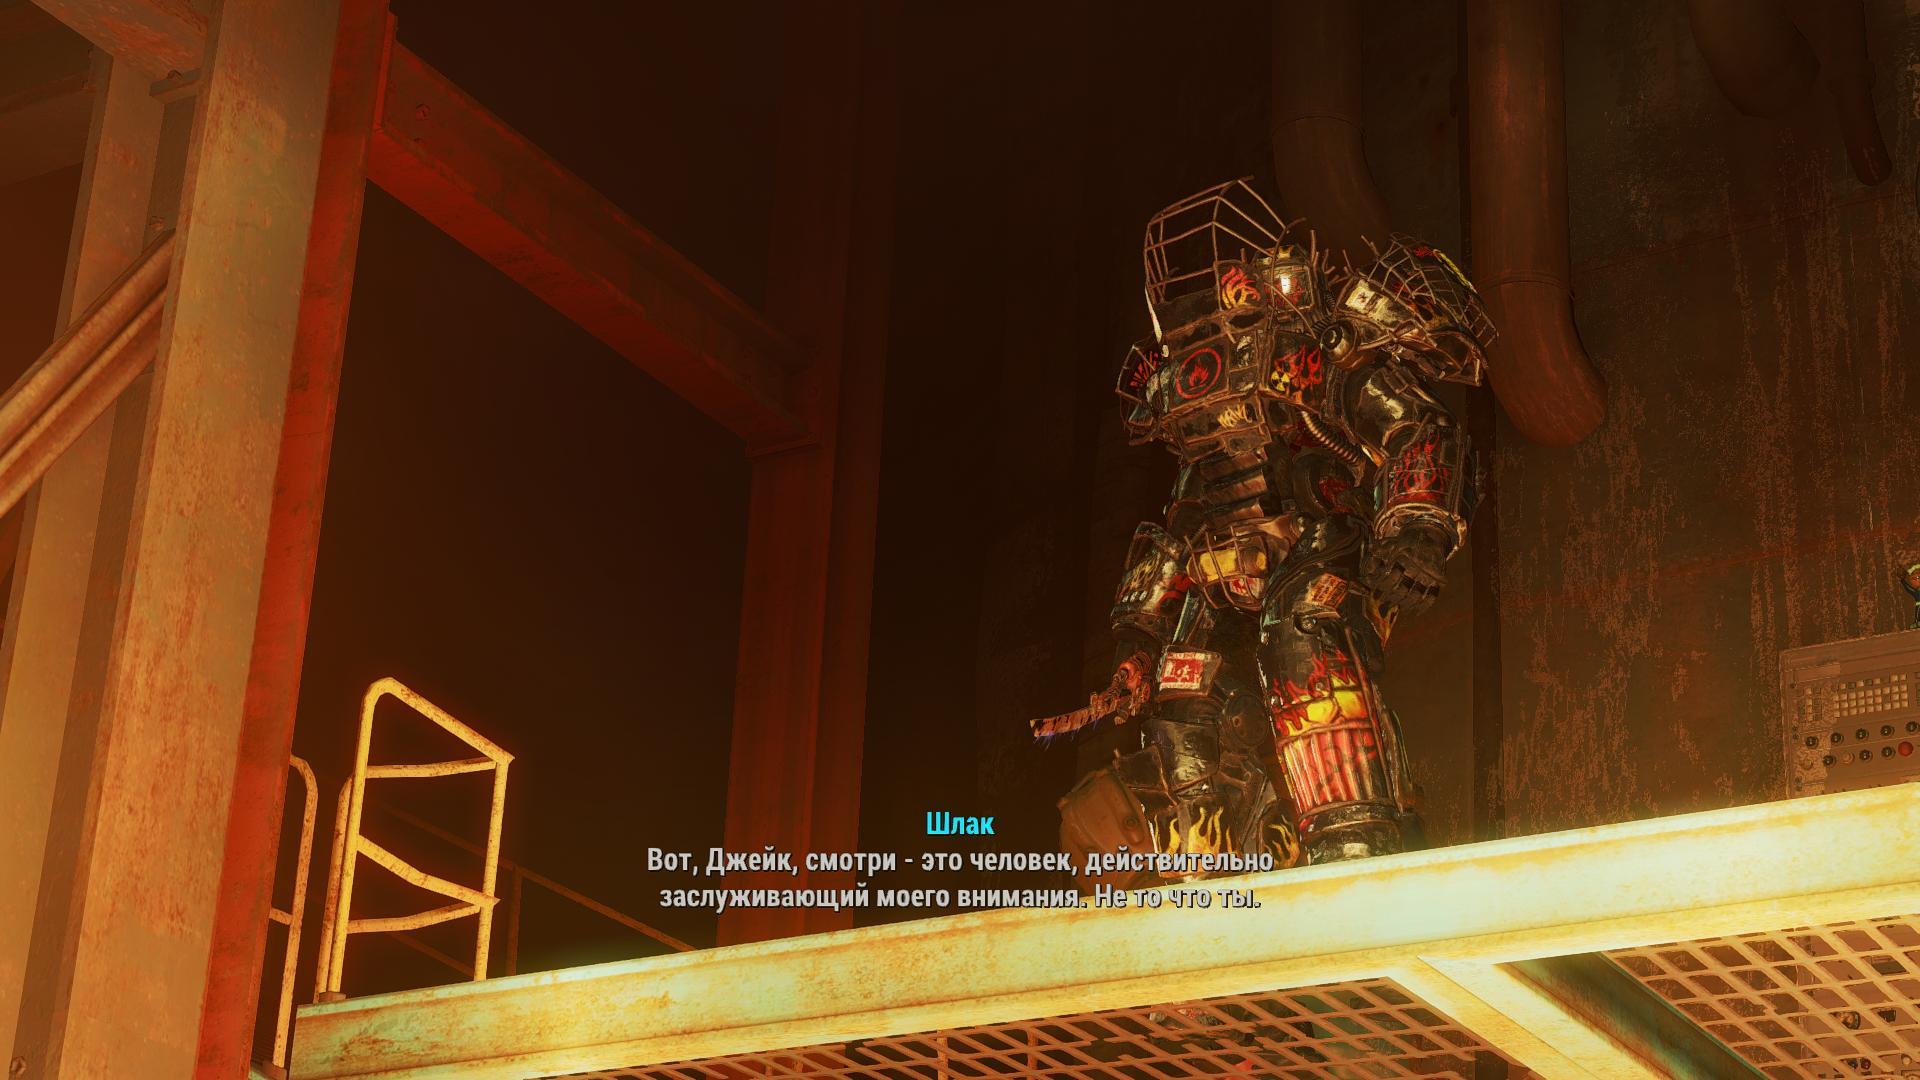 000463.Jpg - Fallout 4